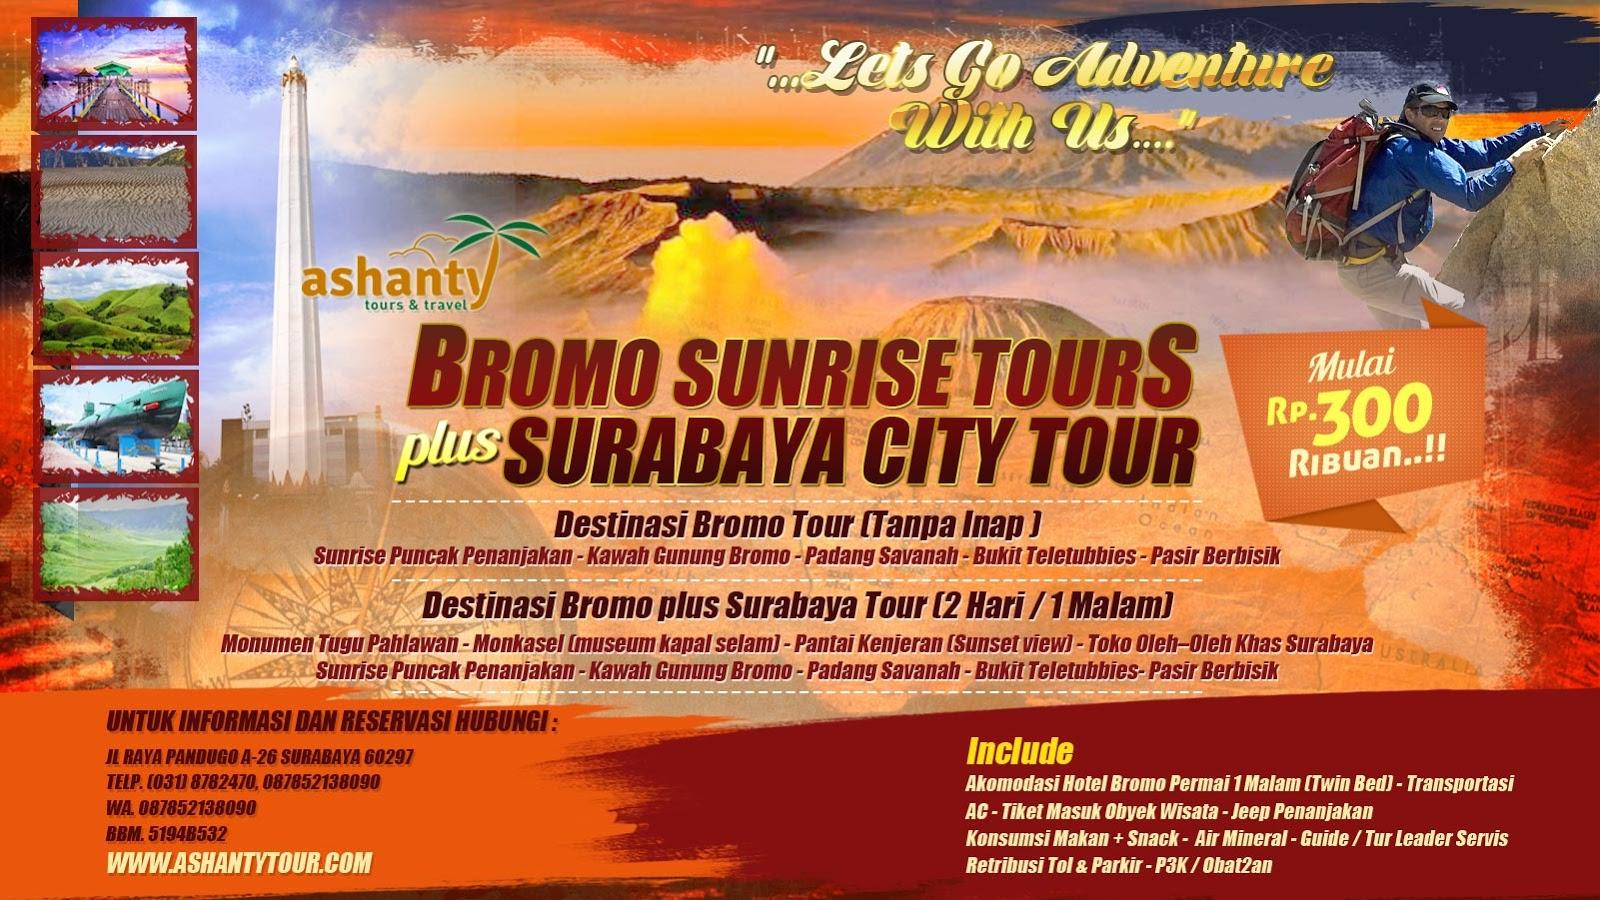 tour bromo murah dari surabaya, paket wisata bromo dari surabaya, paket liburan ke bromo dari surabaya